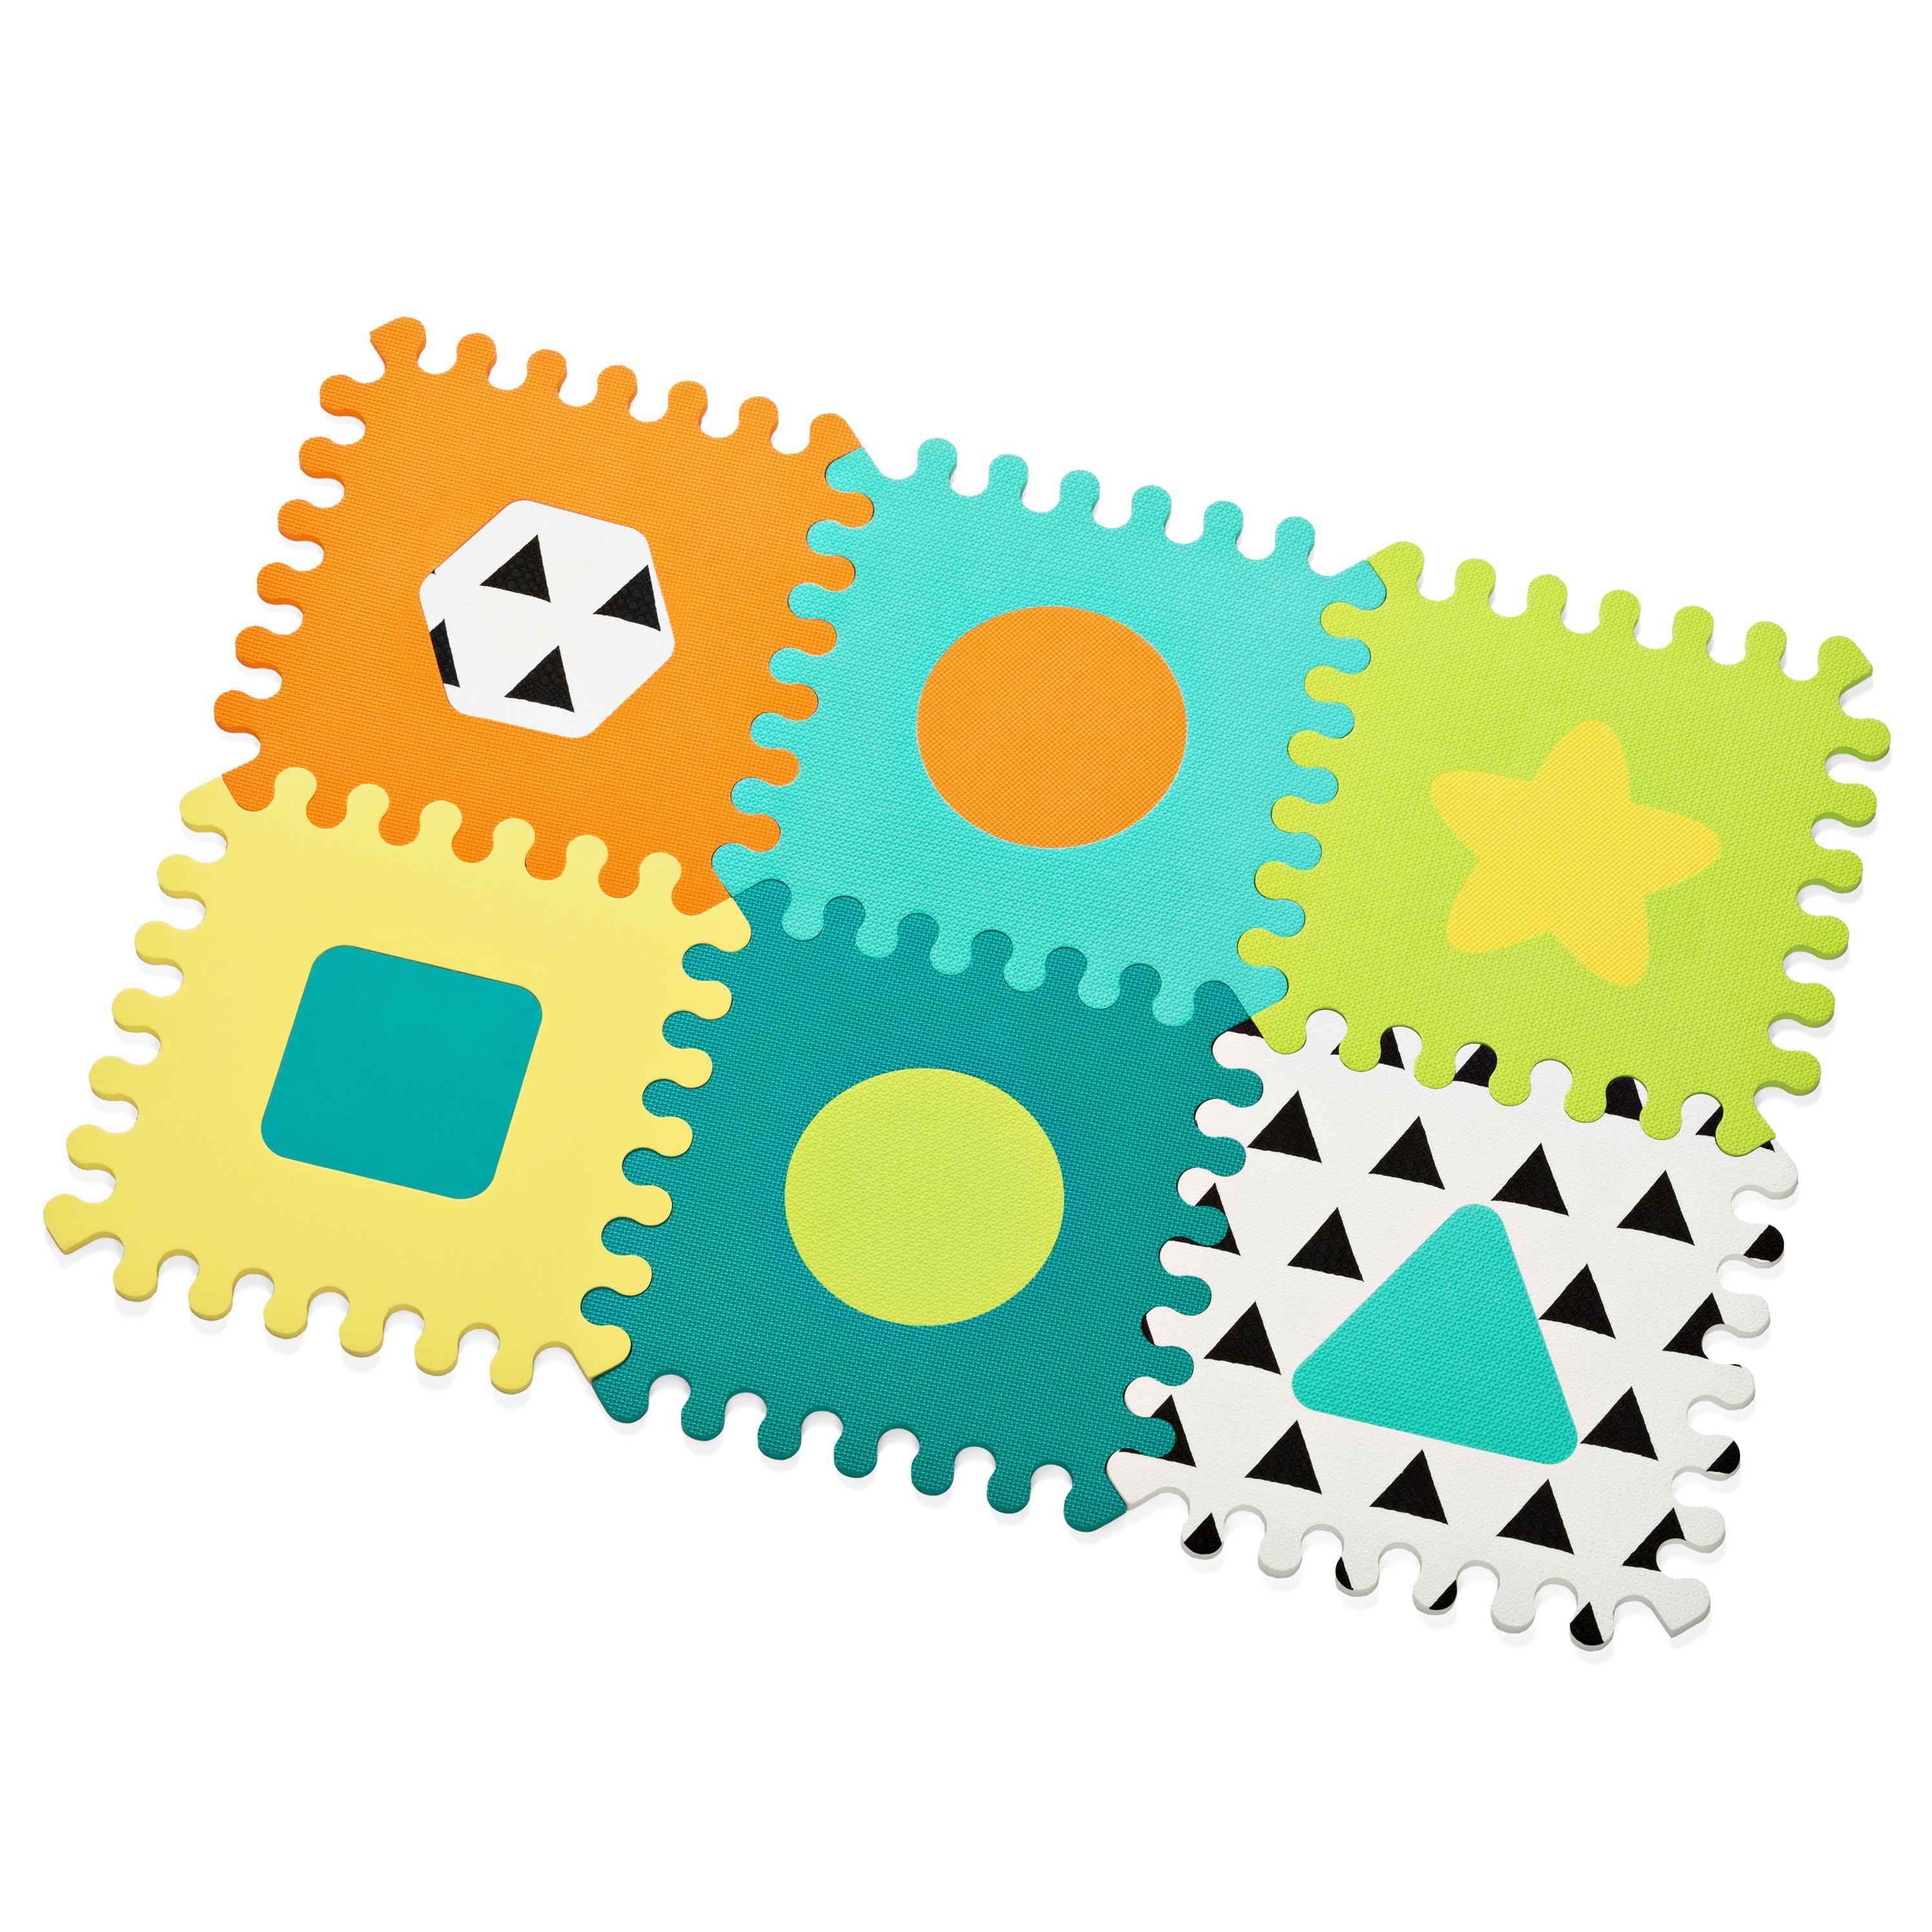 Penové puzzle veselé tvary